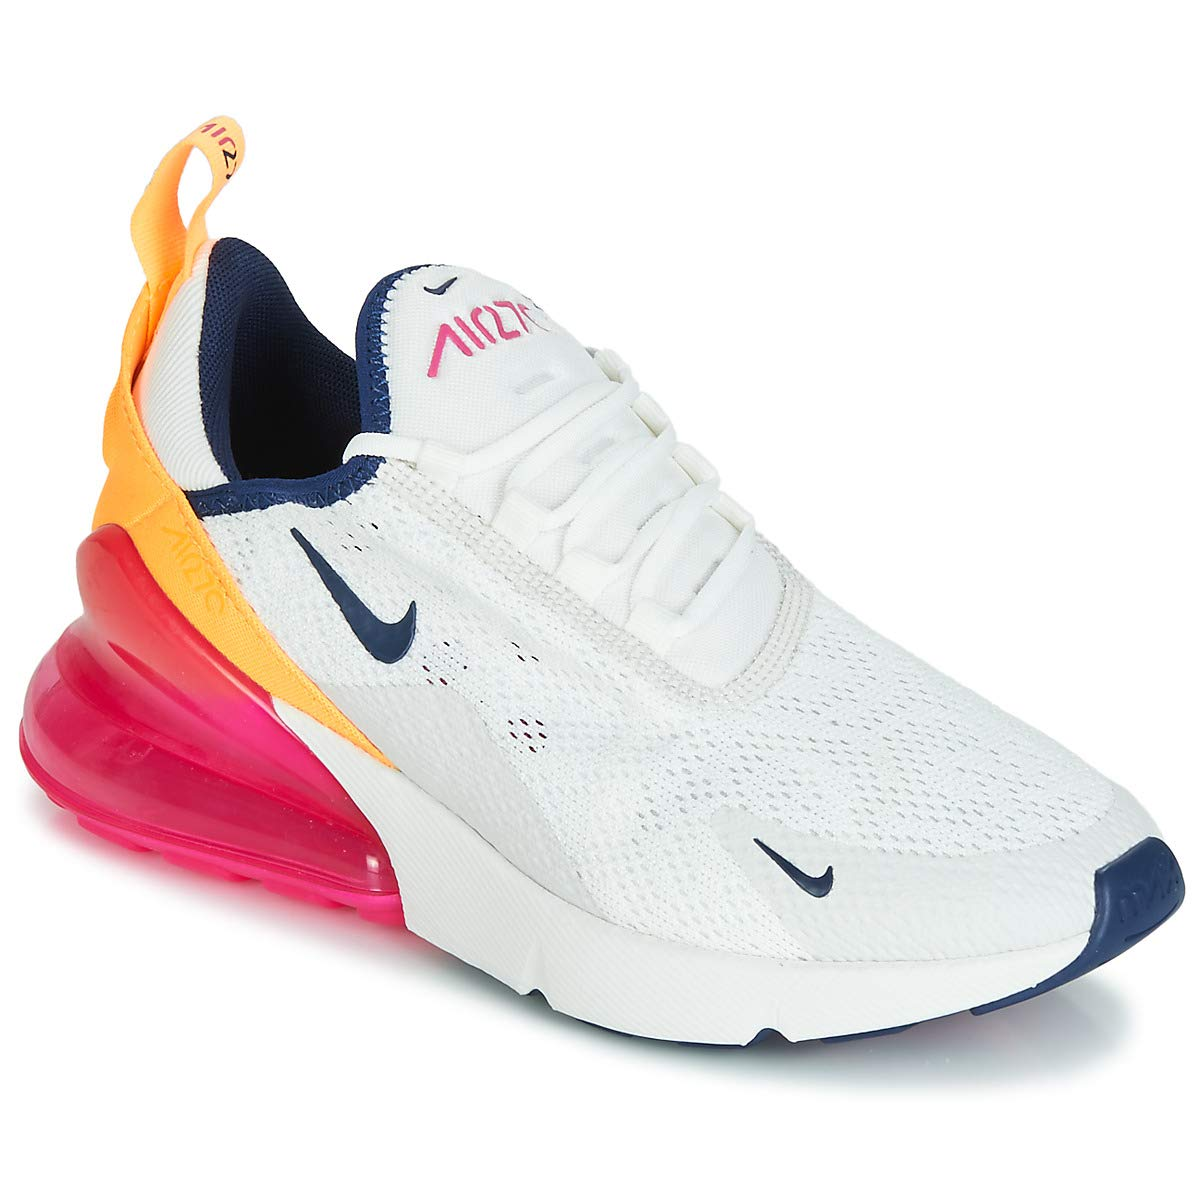 best sneakers 5d953 ffd59 Nike Air Max 270 Women's Shoes Summit White/Midnight Navy/Laser Fuchsia  ah6789-106 (5 B(M) US)